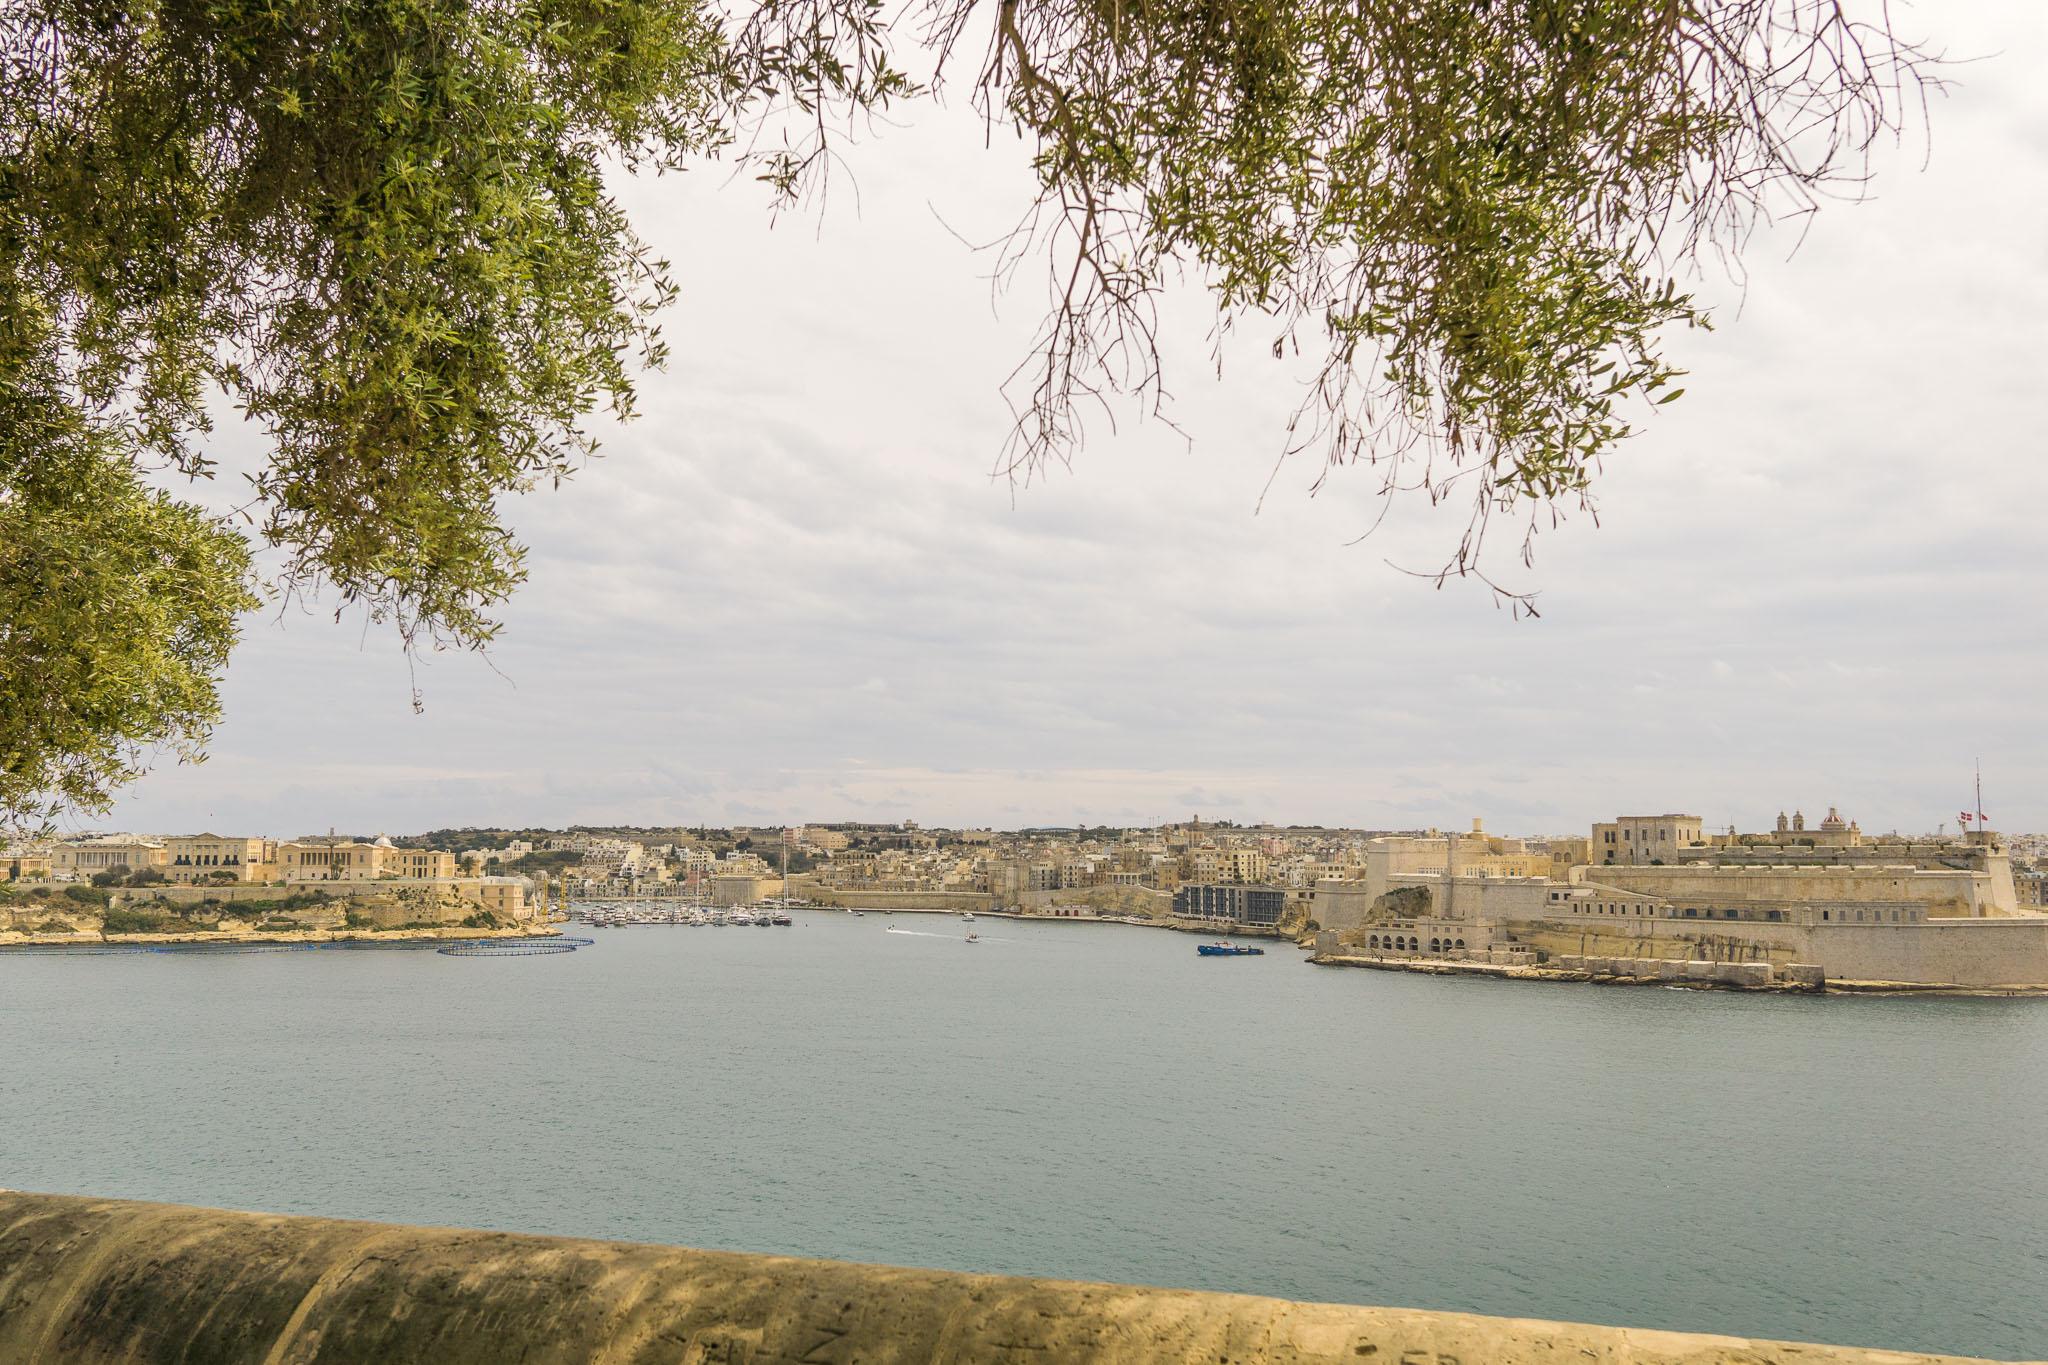 View from the Lower Barrakka Gardens.